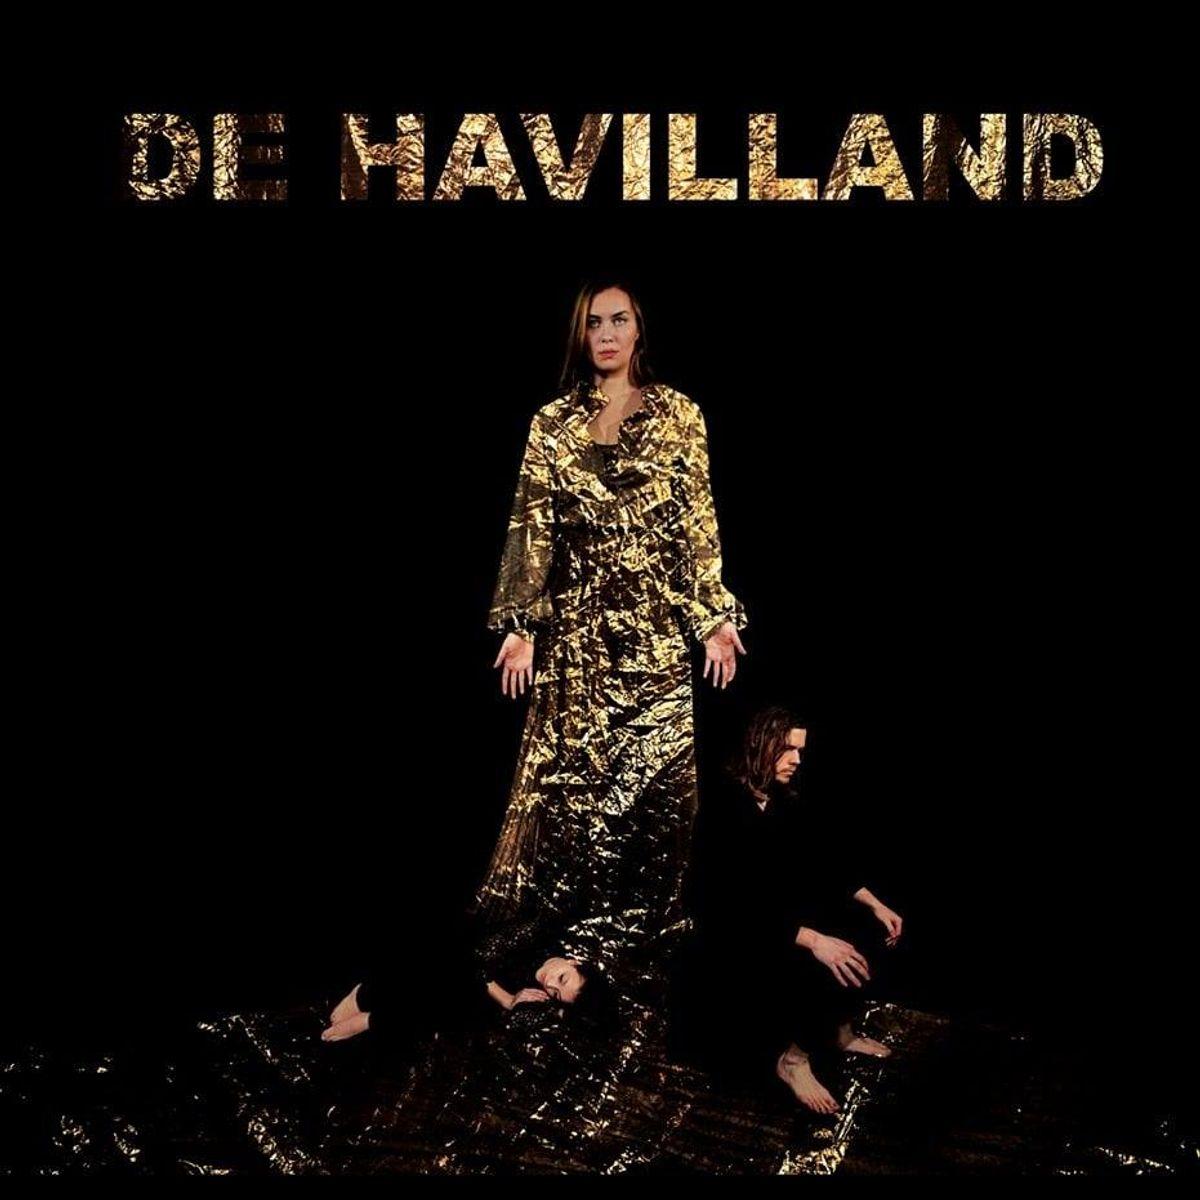 De Havilland - 'De Havilland'